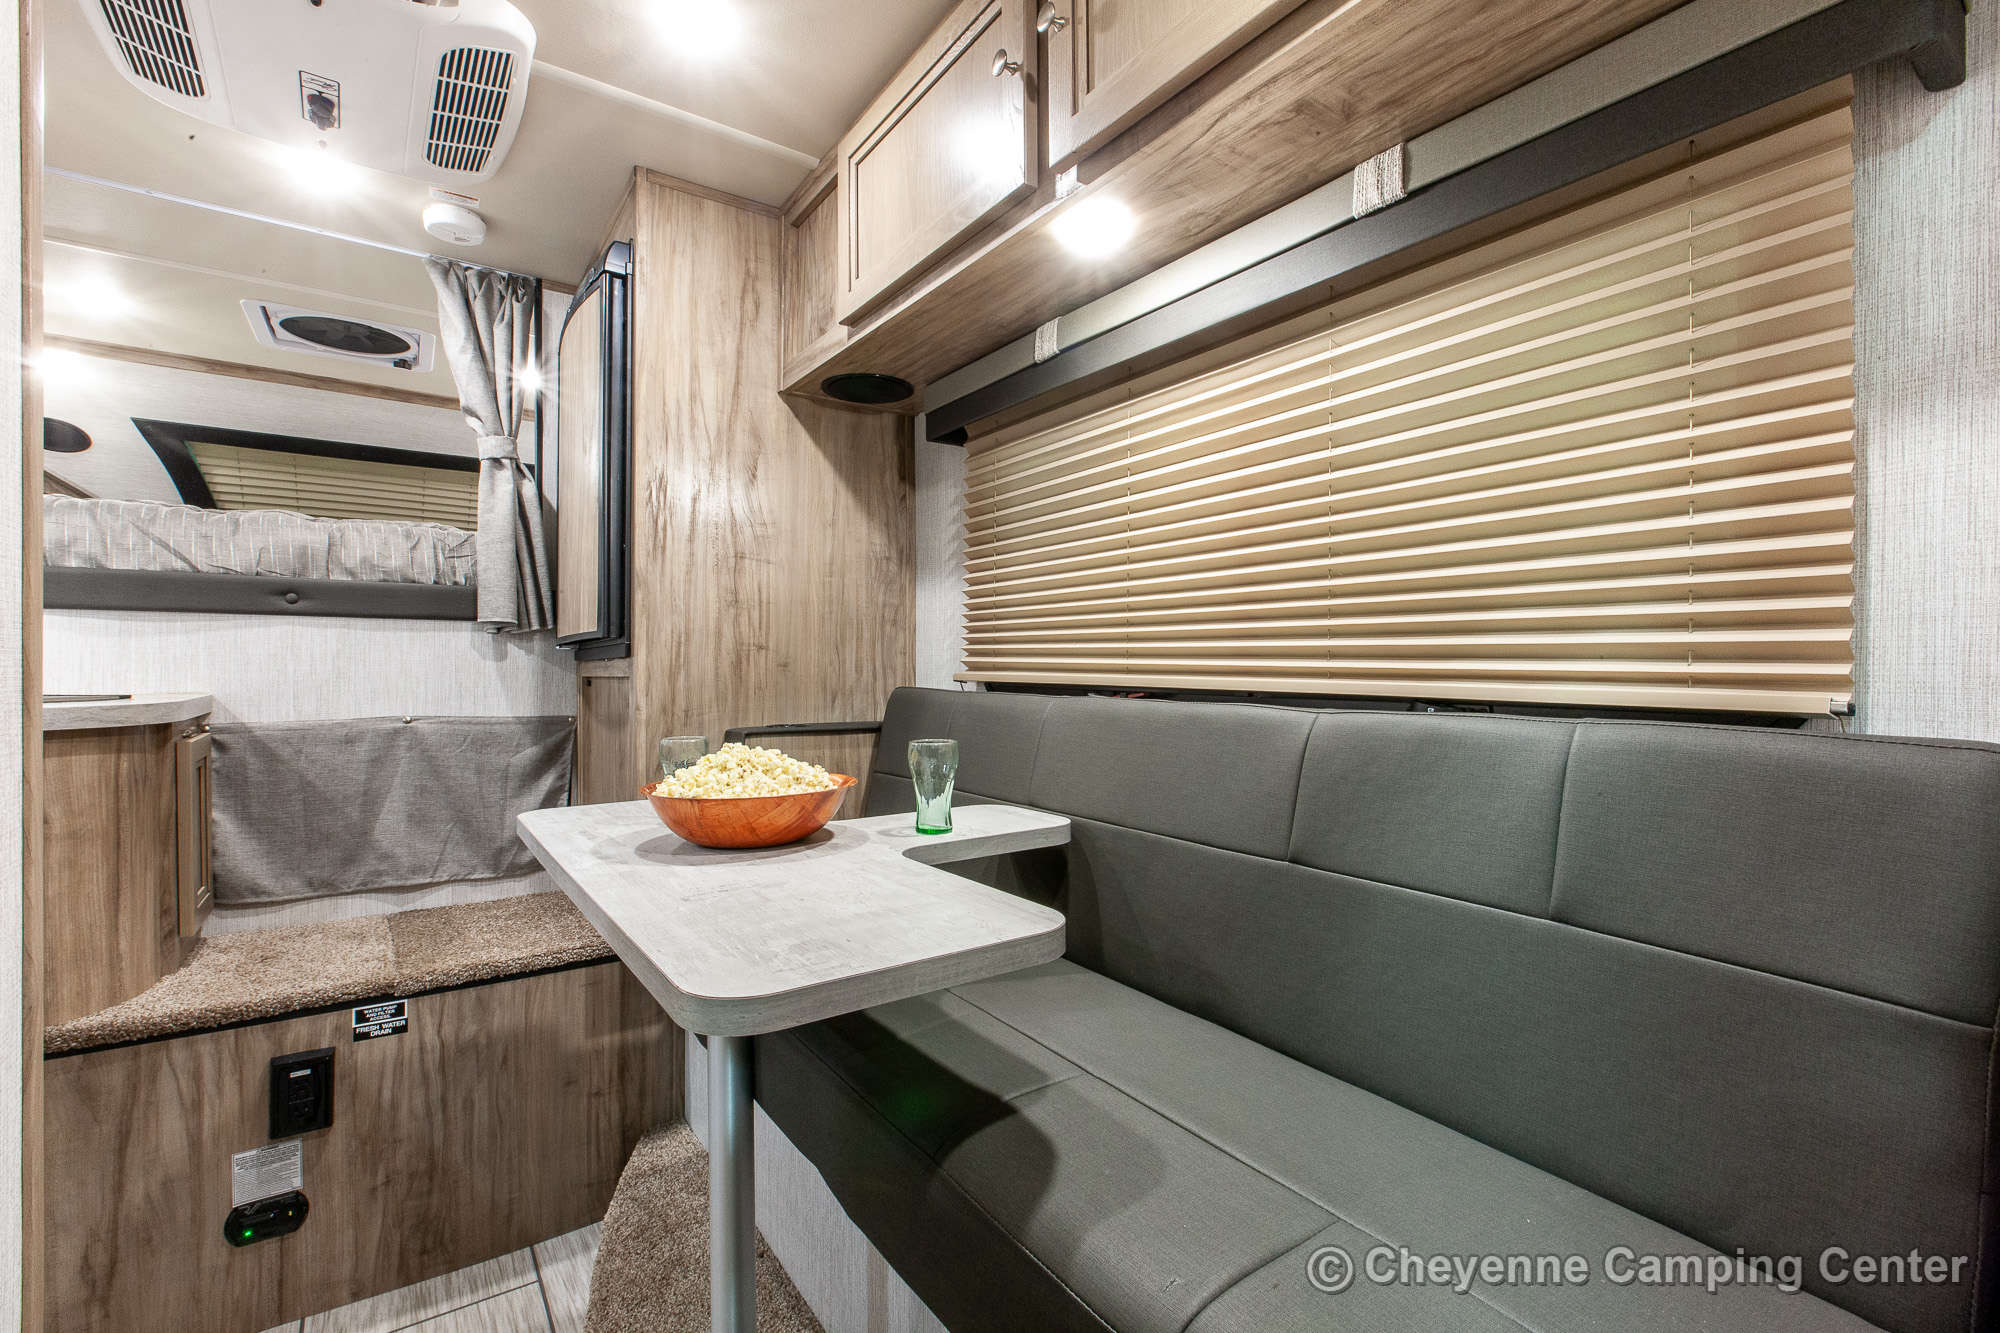 2021 Palomino BackPack HS-750 Truck Camper Interior Image